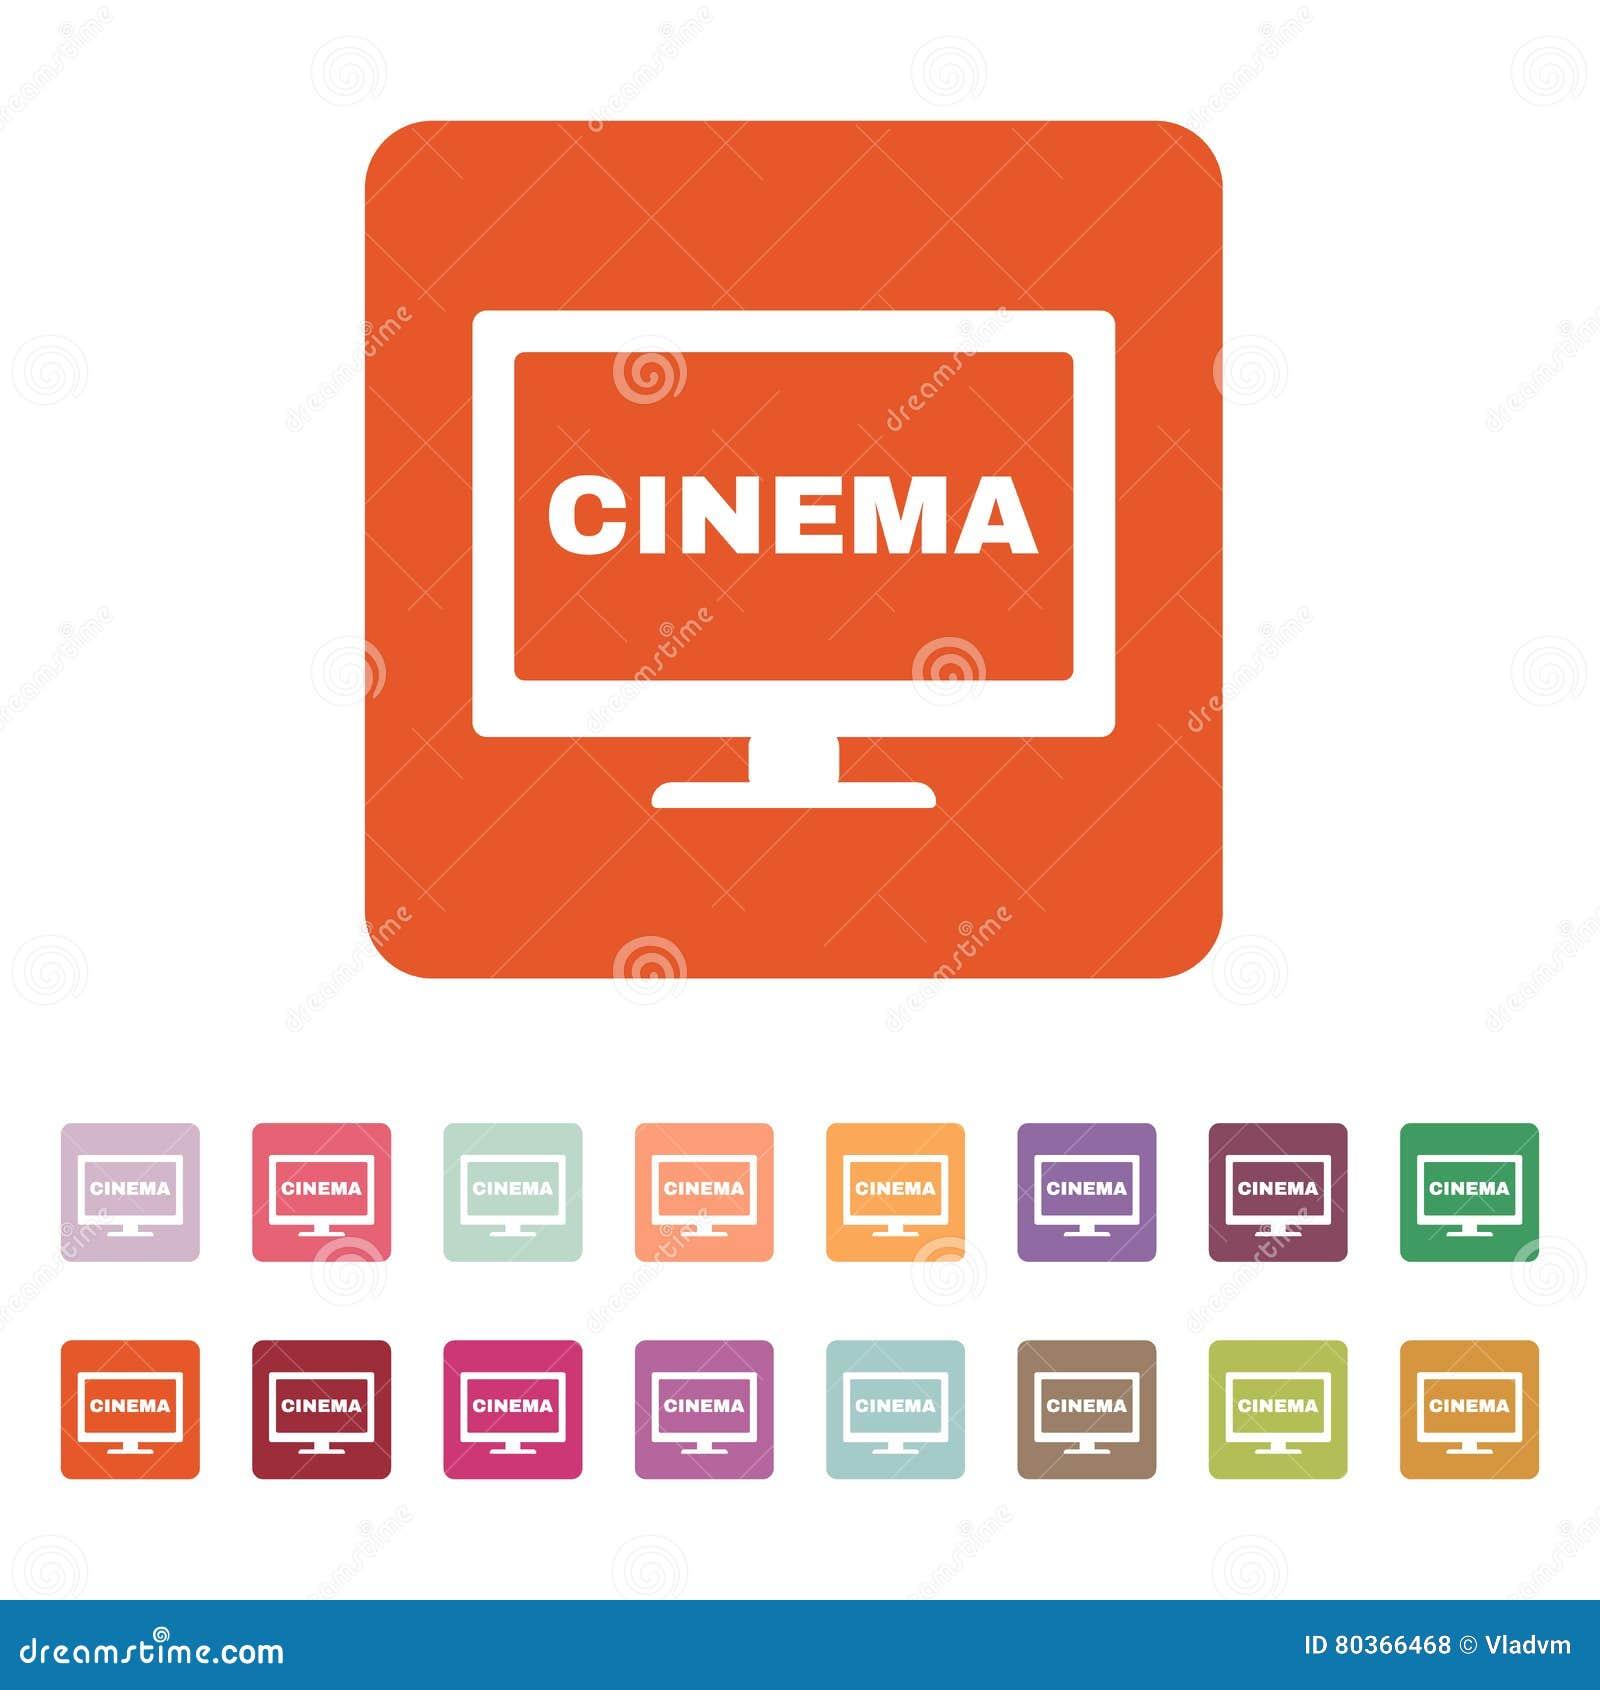 Cinema Cartoons, Illustrations & Vector Stock Images ...